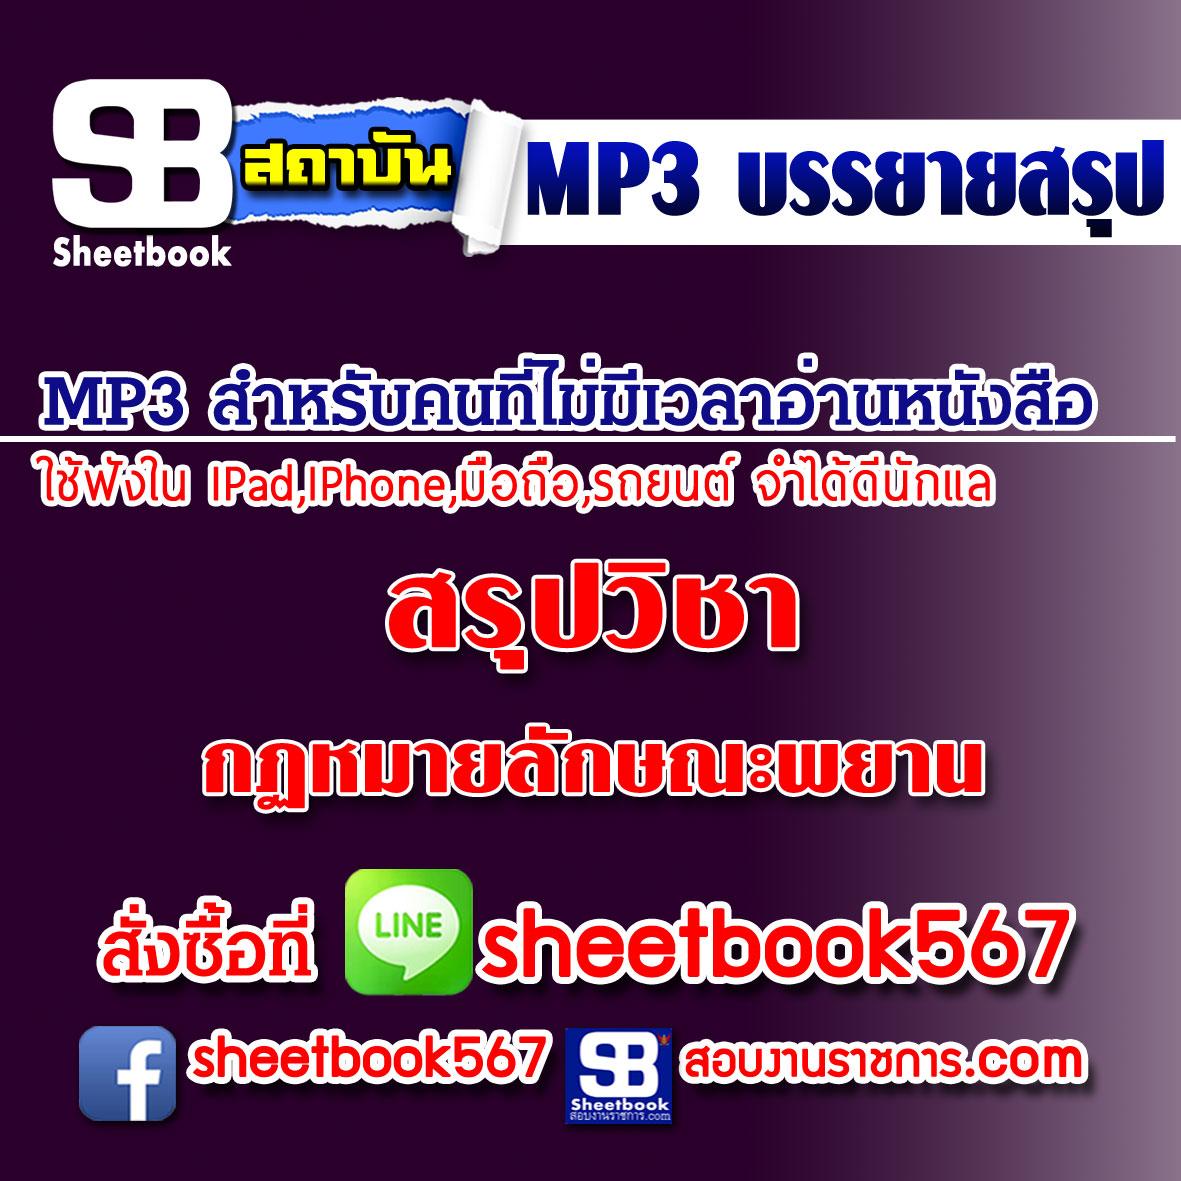 P035 - สรุปวิชา กฎหมายลักษณะพยาน